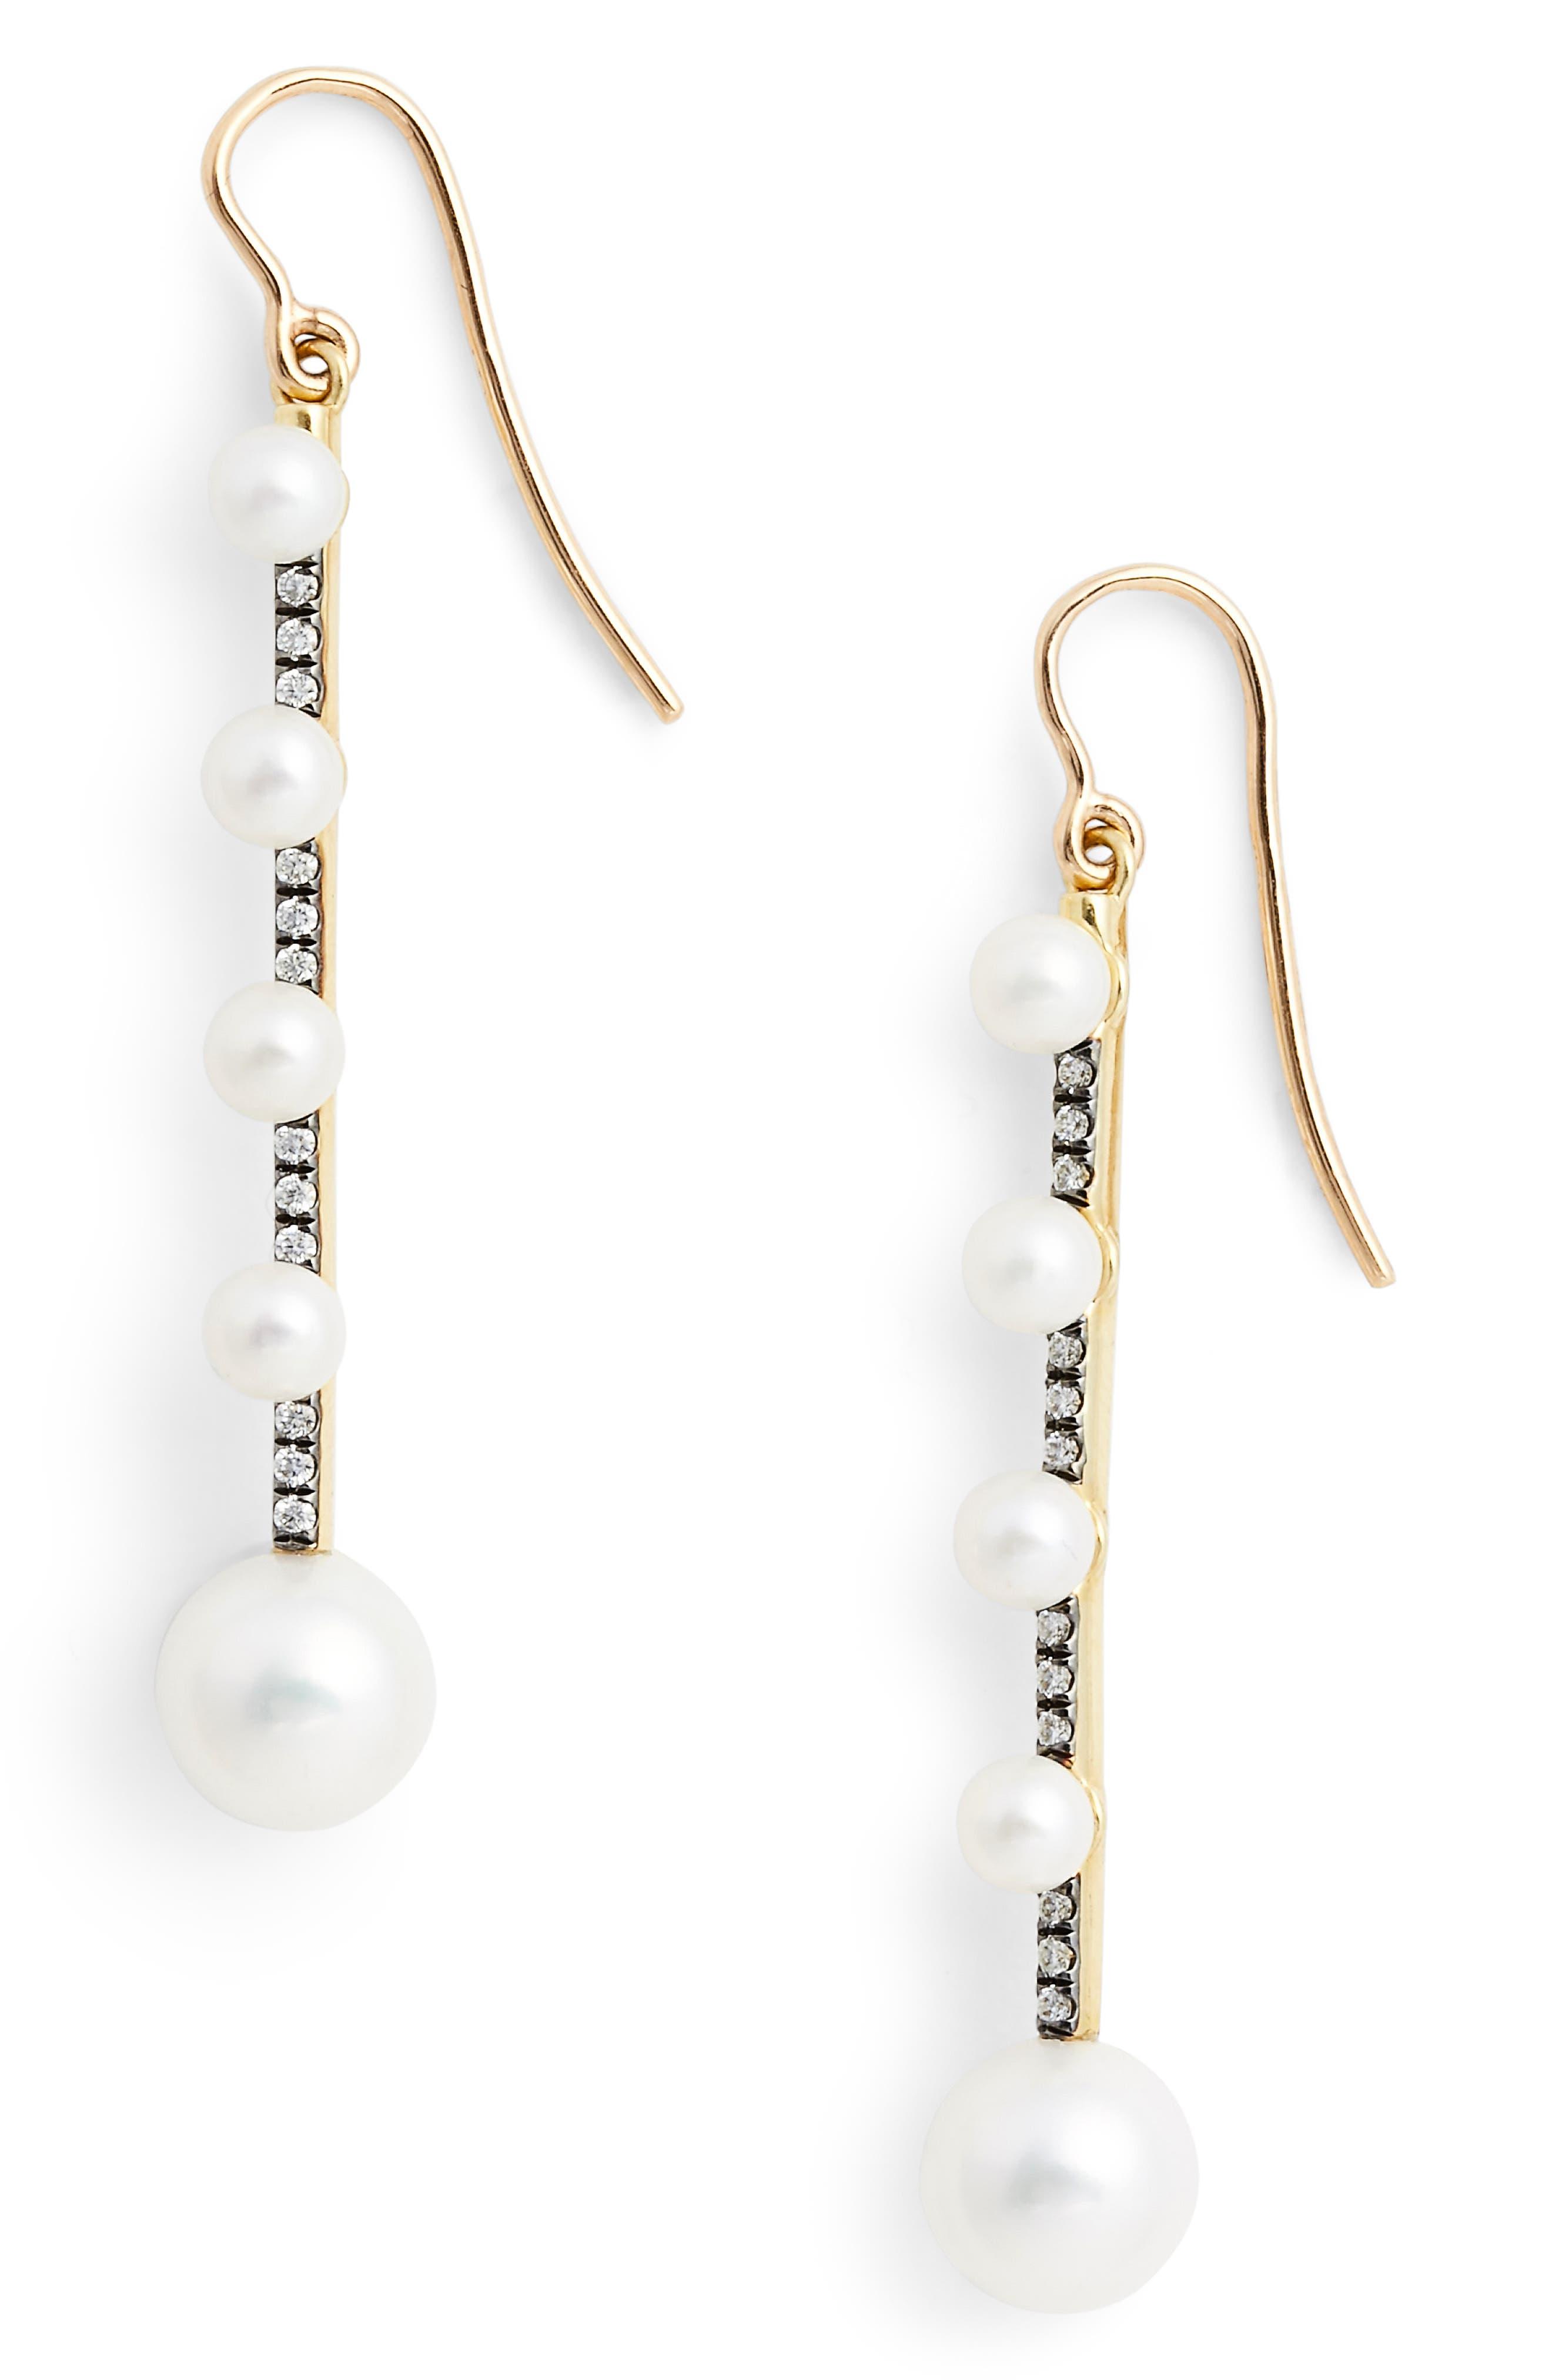 Prive Pearl & Diamond Drop Earrings,                         Main,                         color, WHT PRL/DMND/BLK RHDM